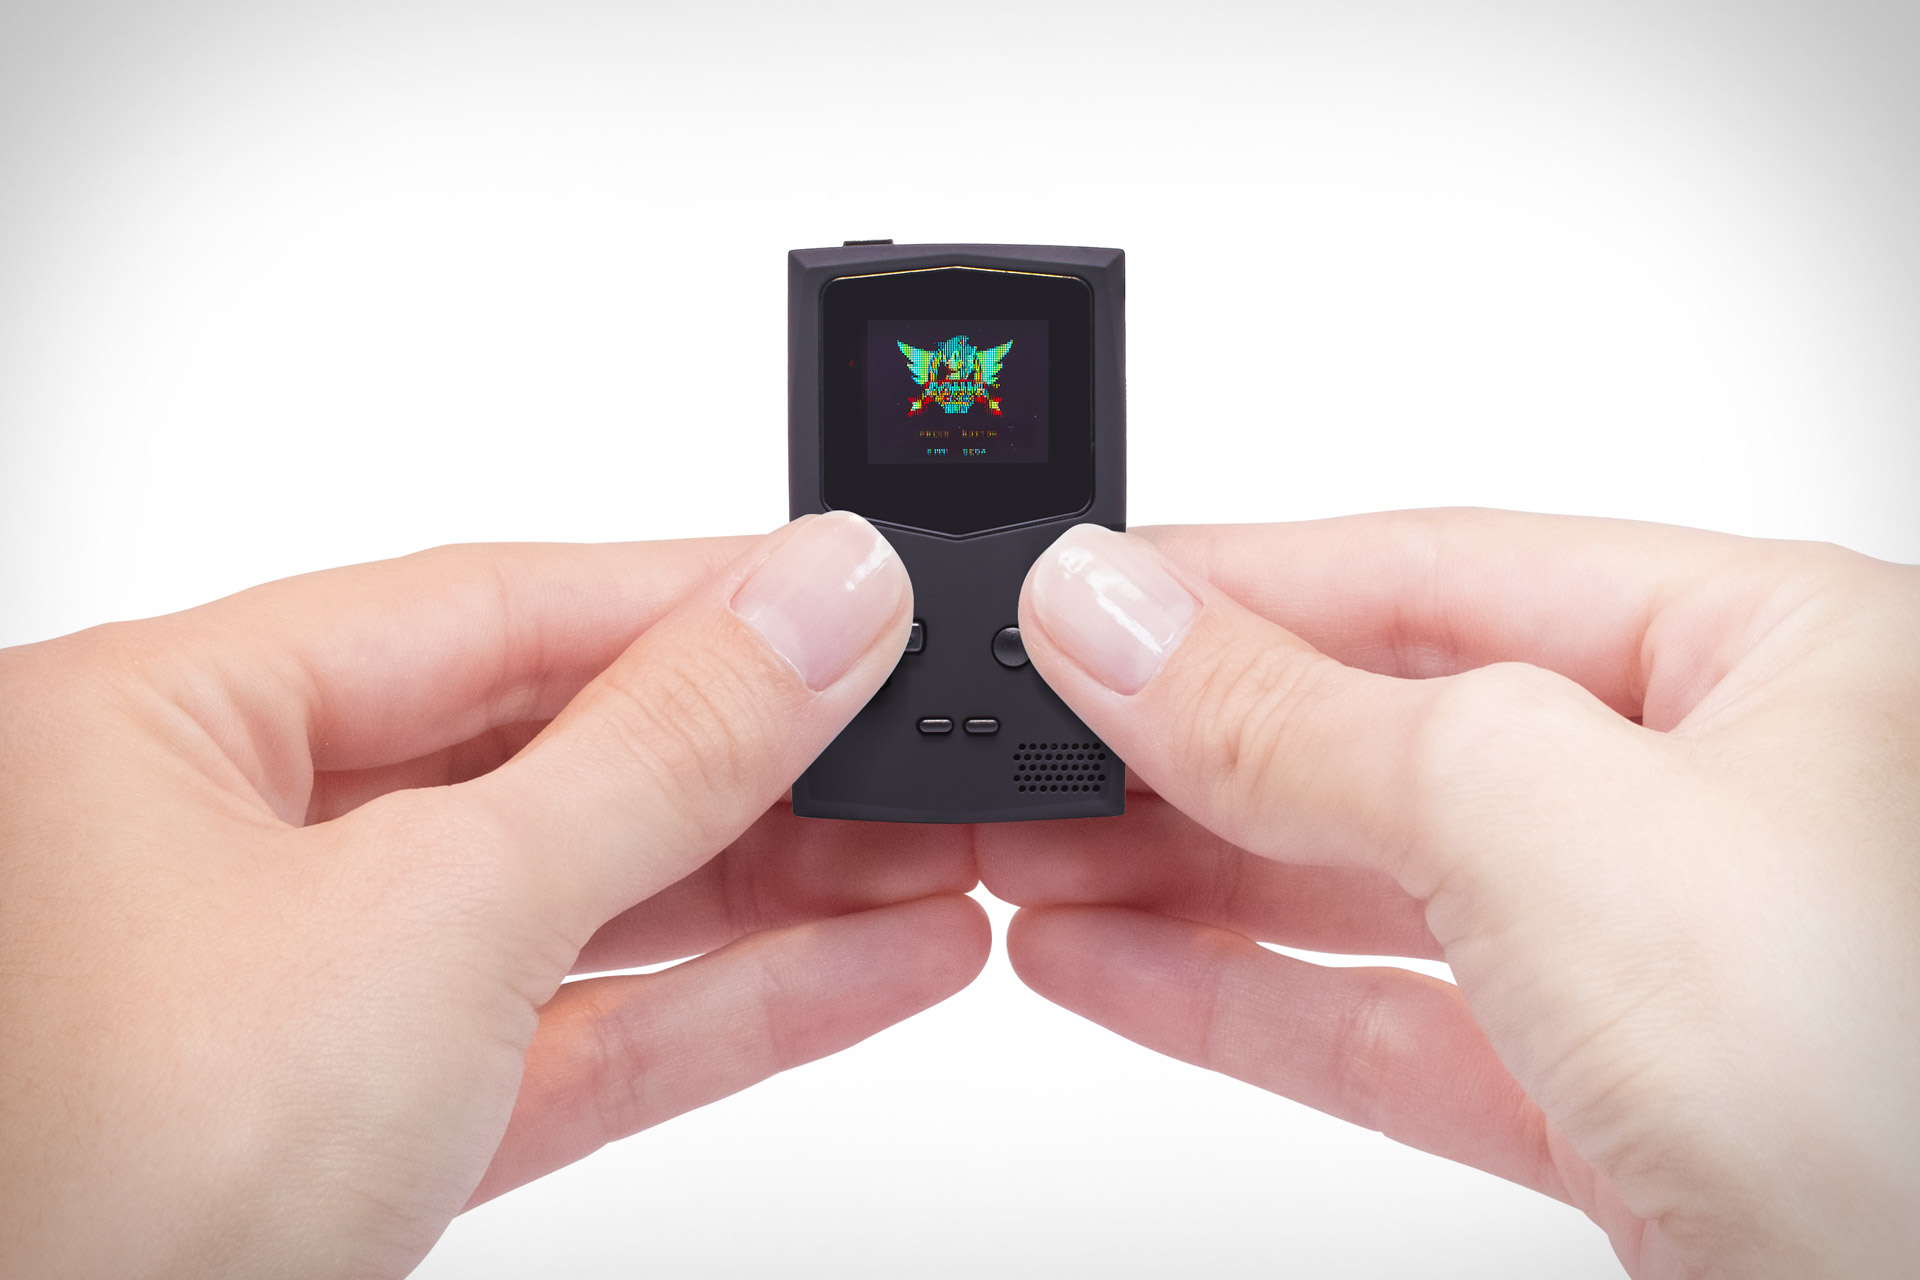 PocketSprite Keychain Gaming Console